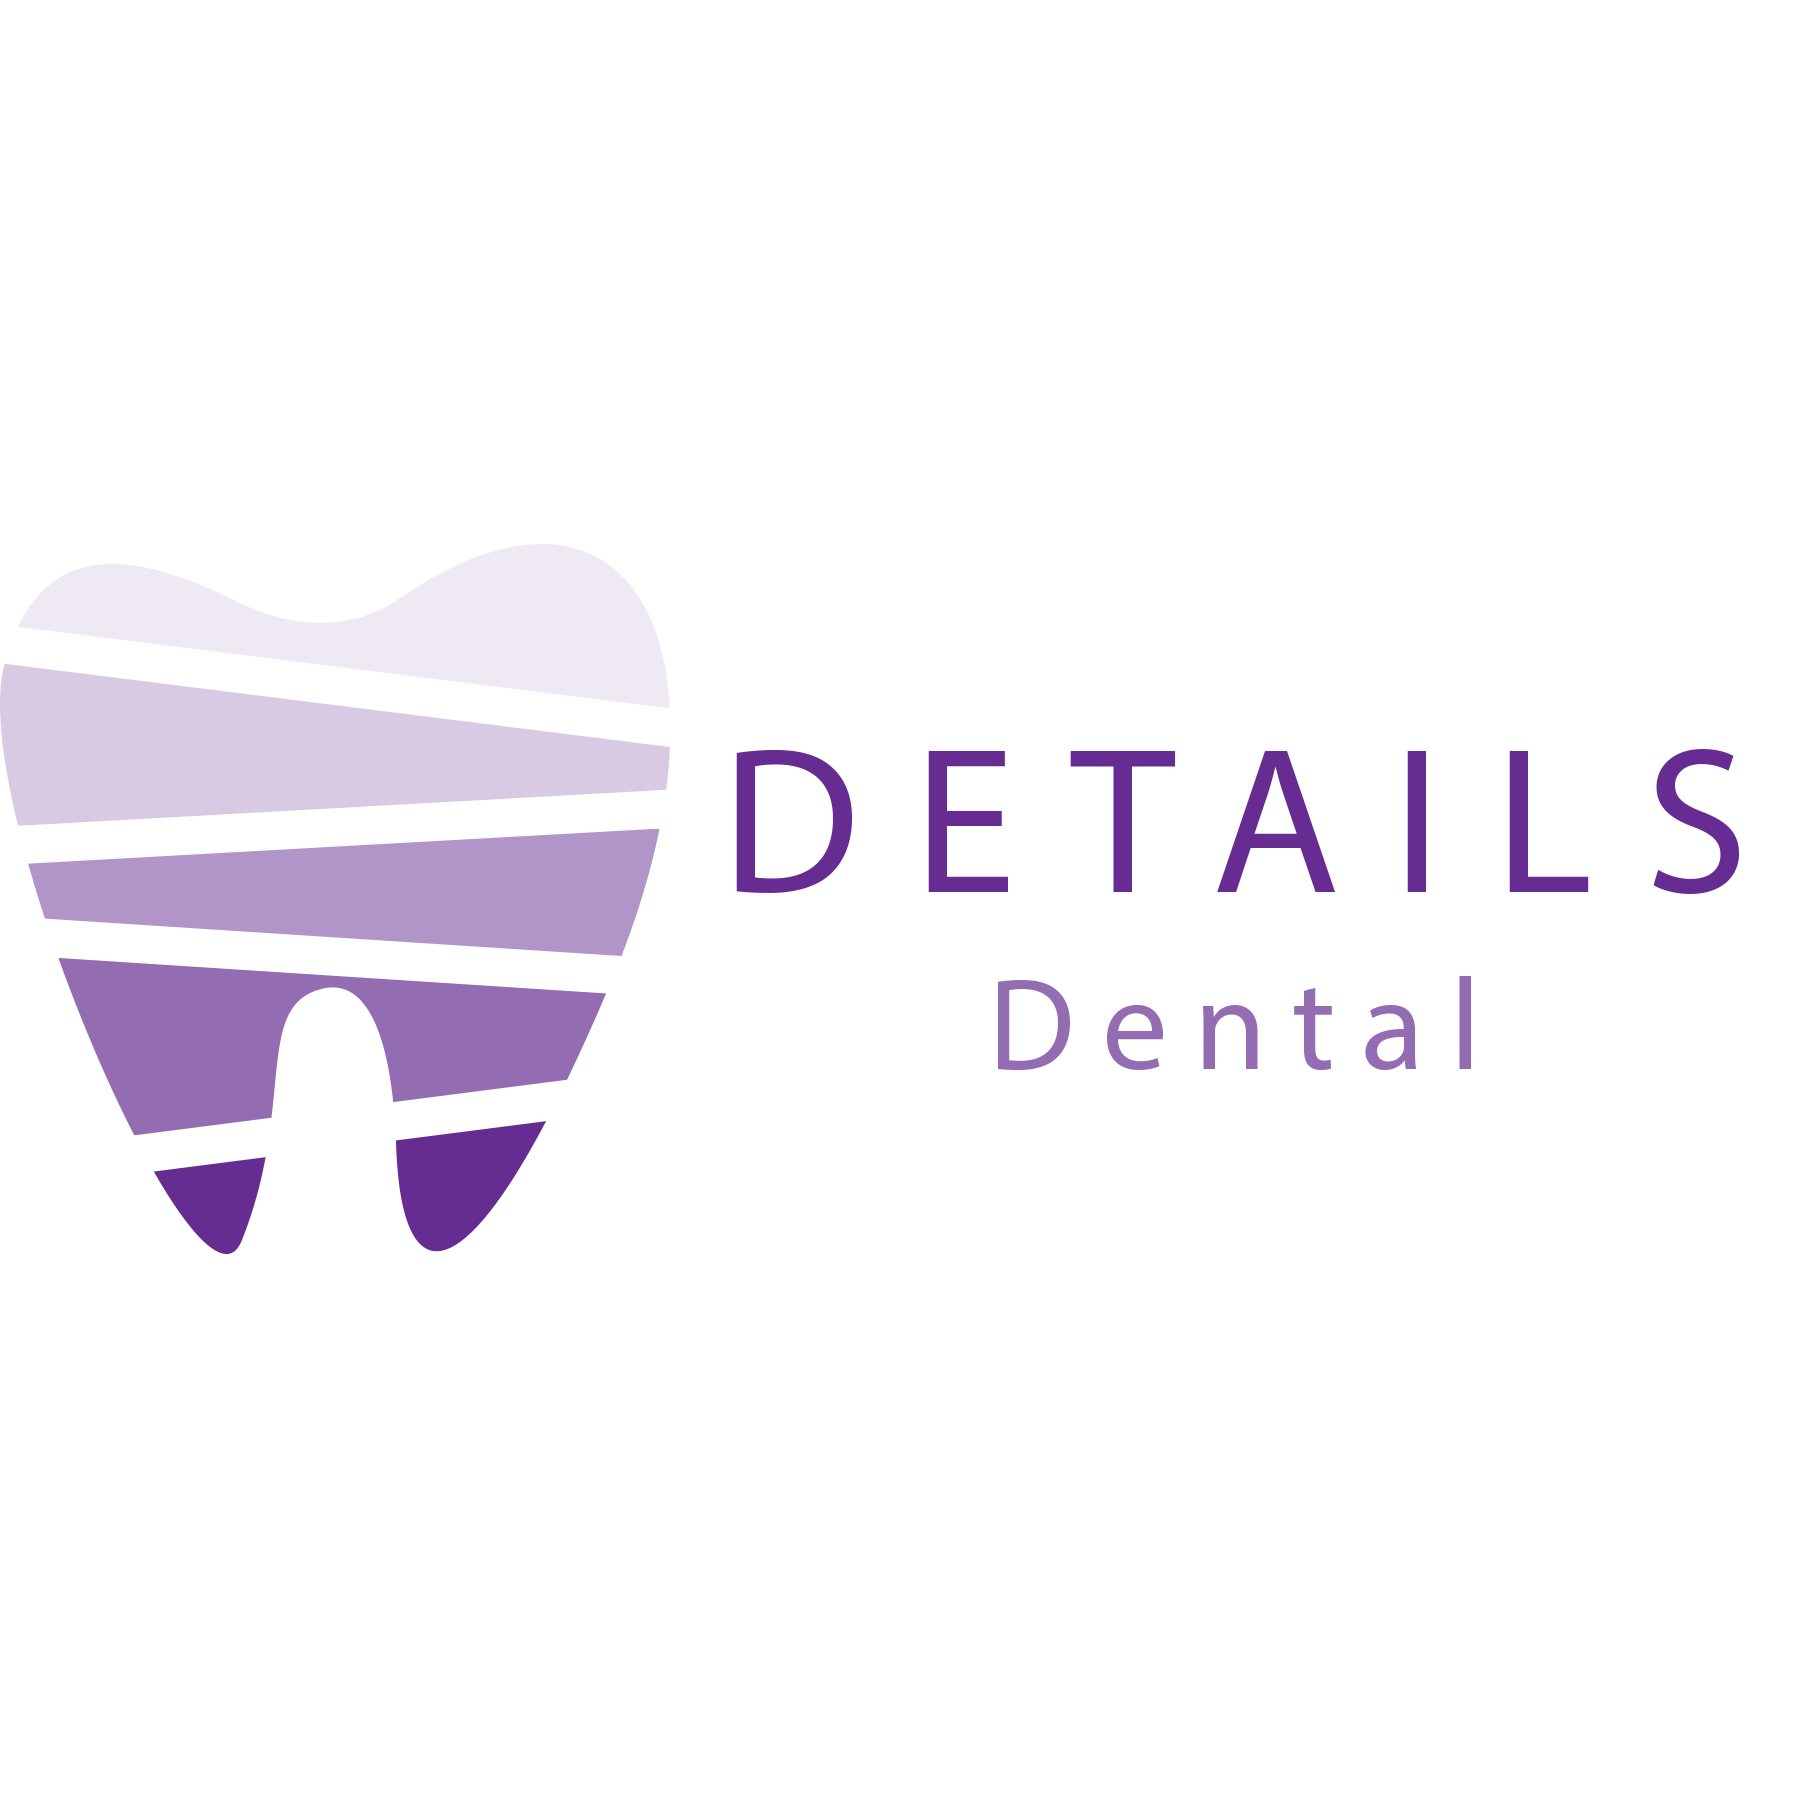 Details Dental - Dr. Natalia Ferrer-Leon